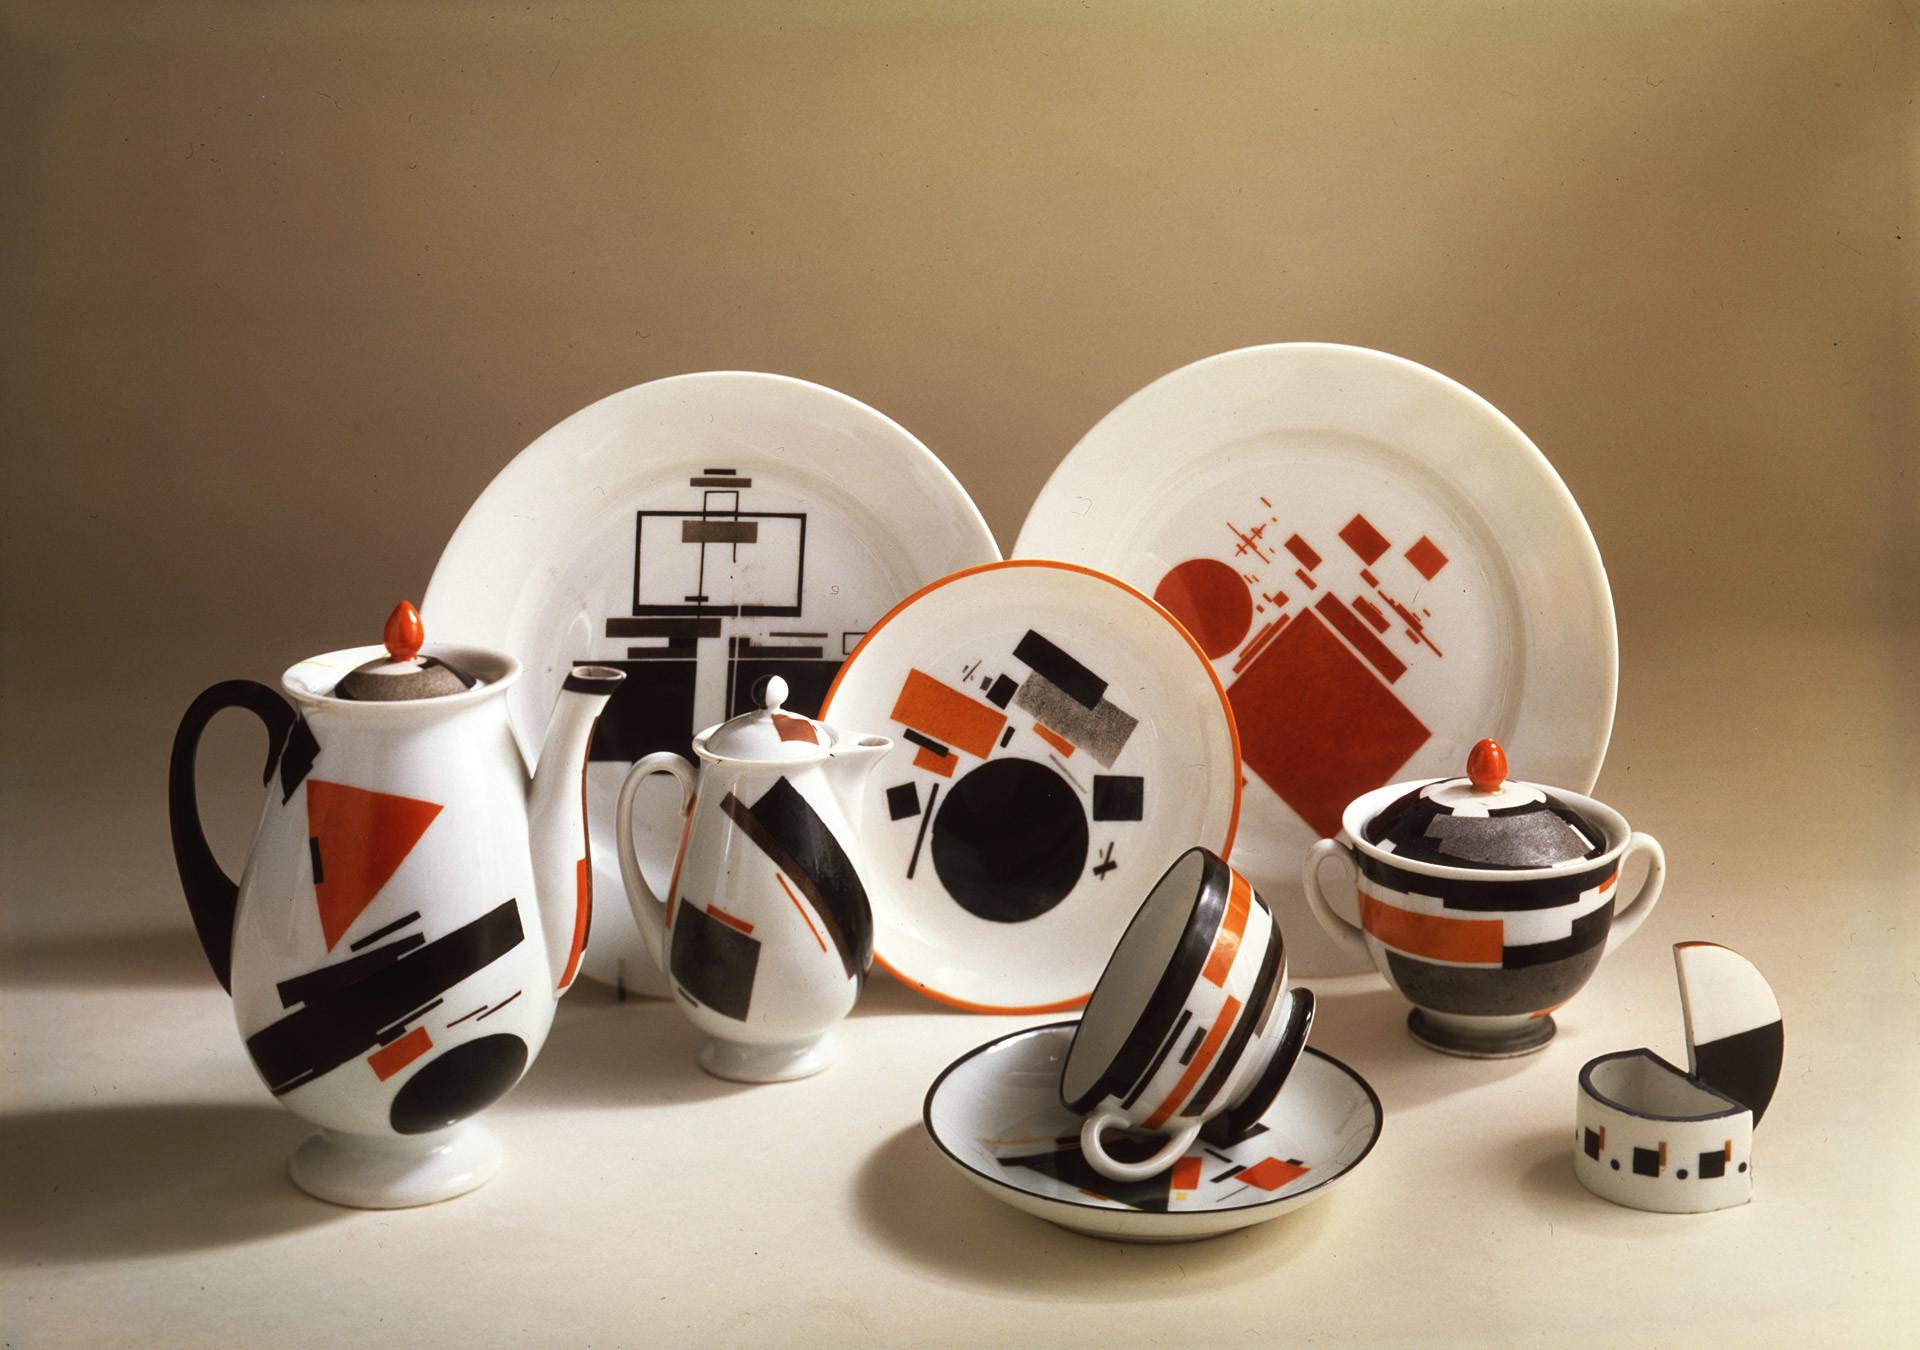 'Suprematism' set, by V. Chekhonin and N. Suetin. 1923. The Leningrad Porcelain Museum named after Lomonosov.